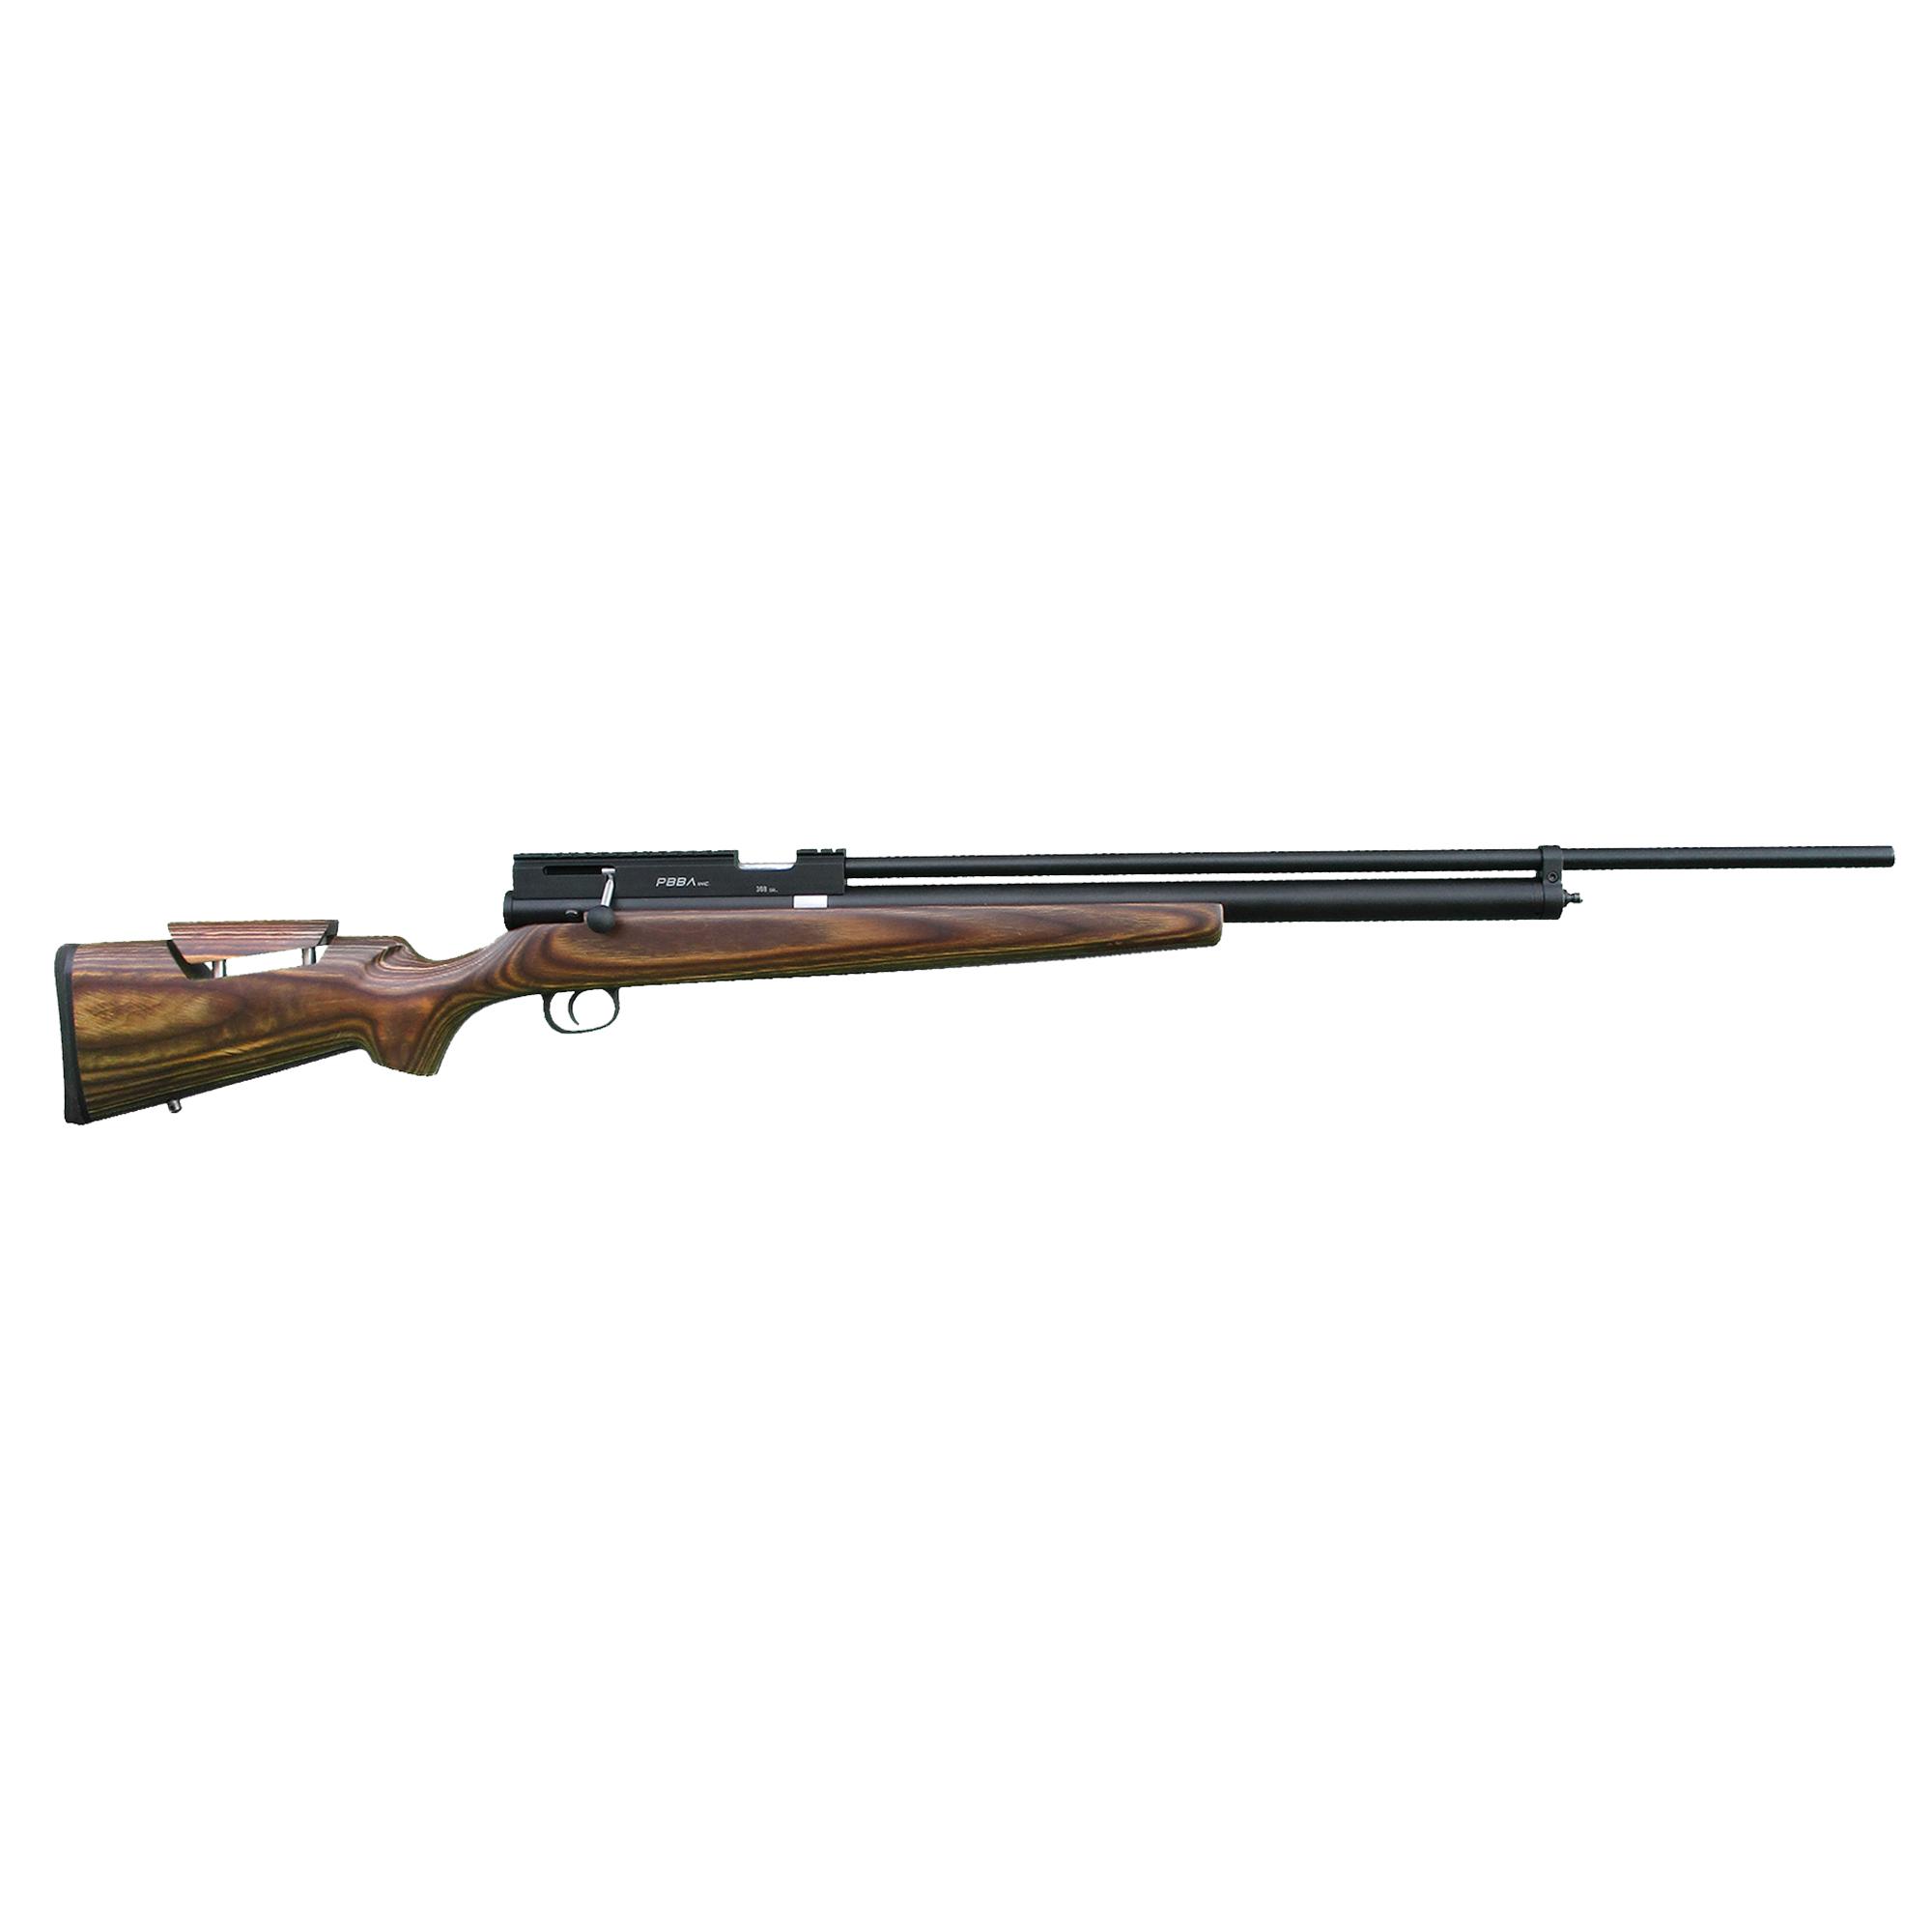 Pro Air Rifle Hunting Big Bore Air Guns By Pbba Inc